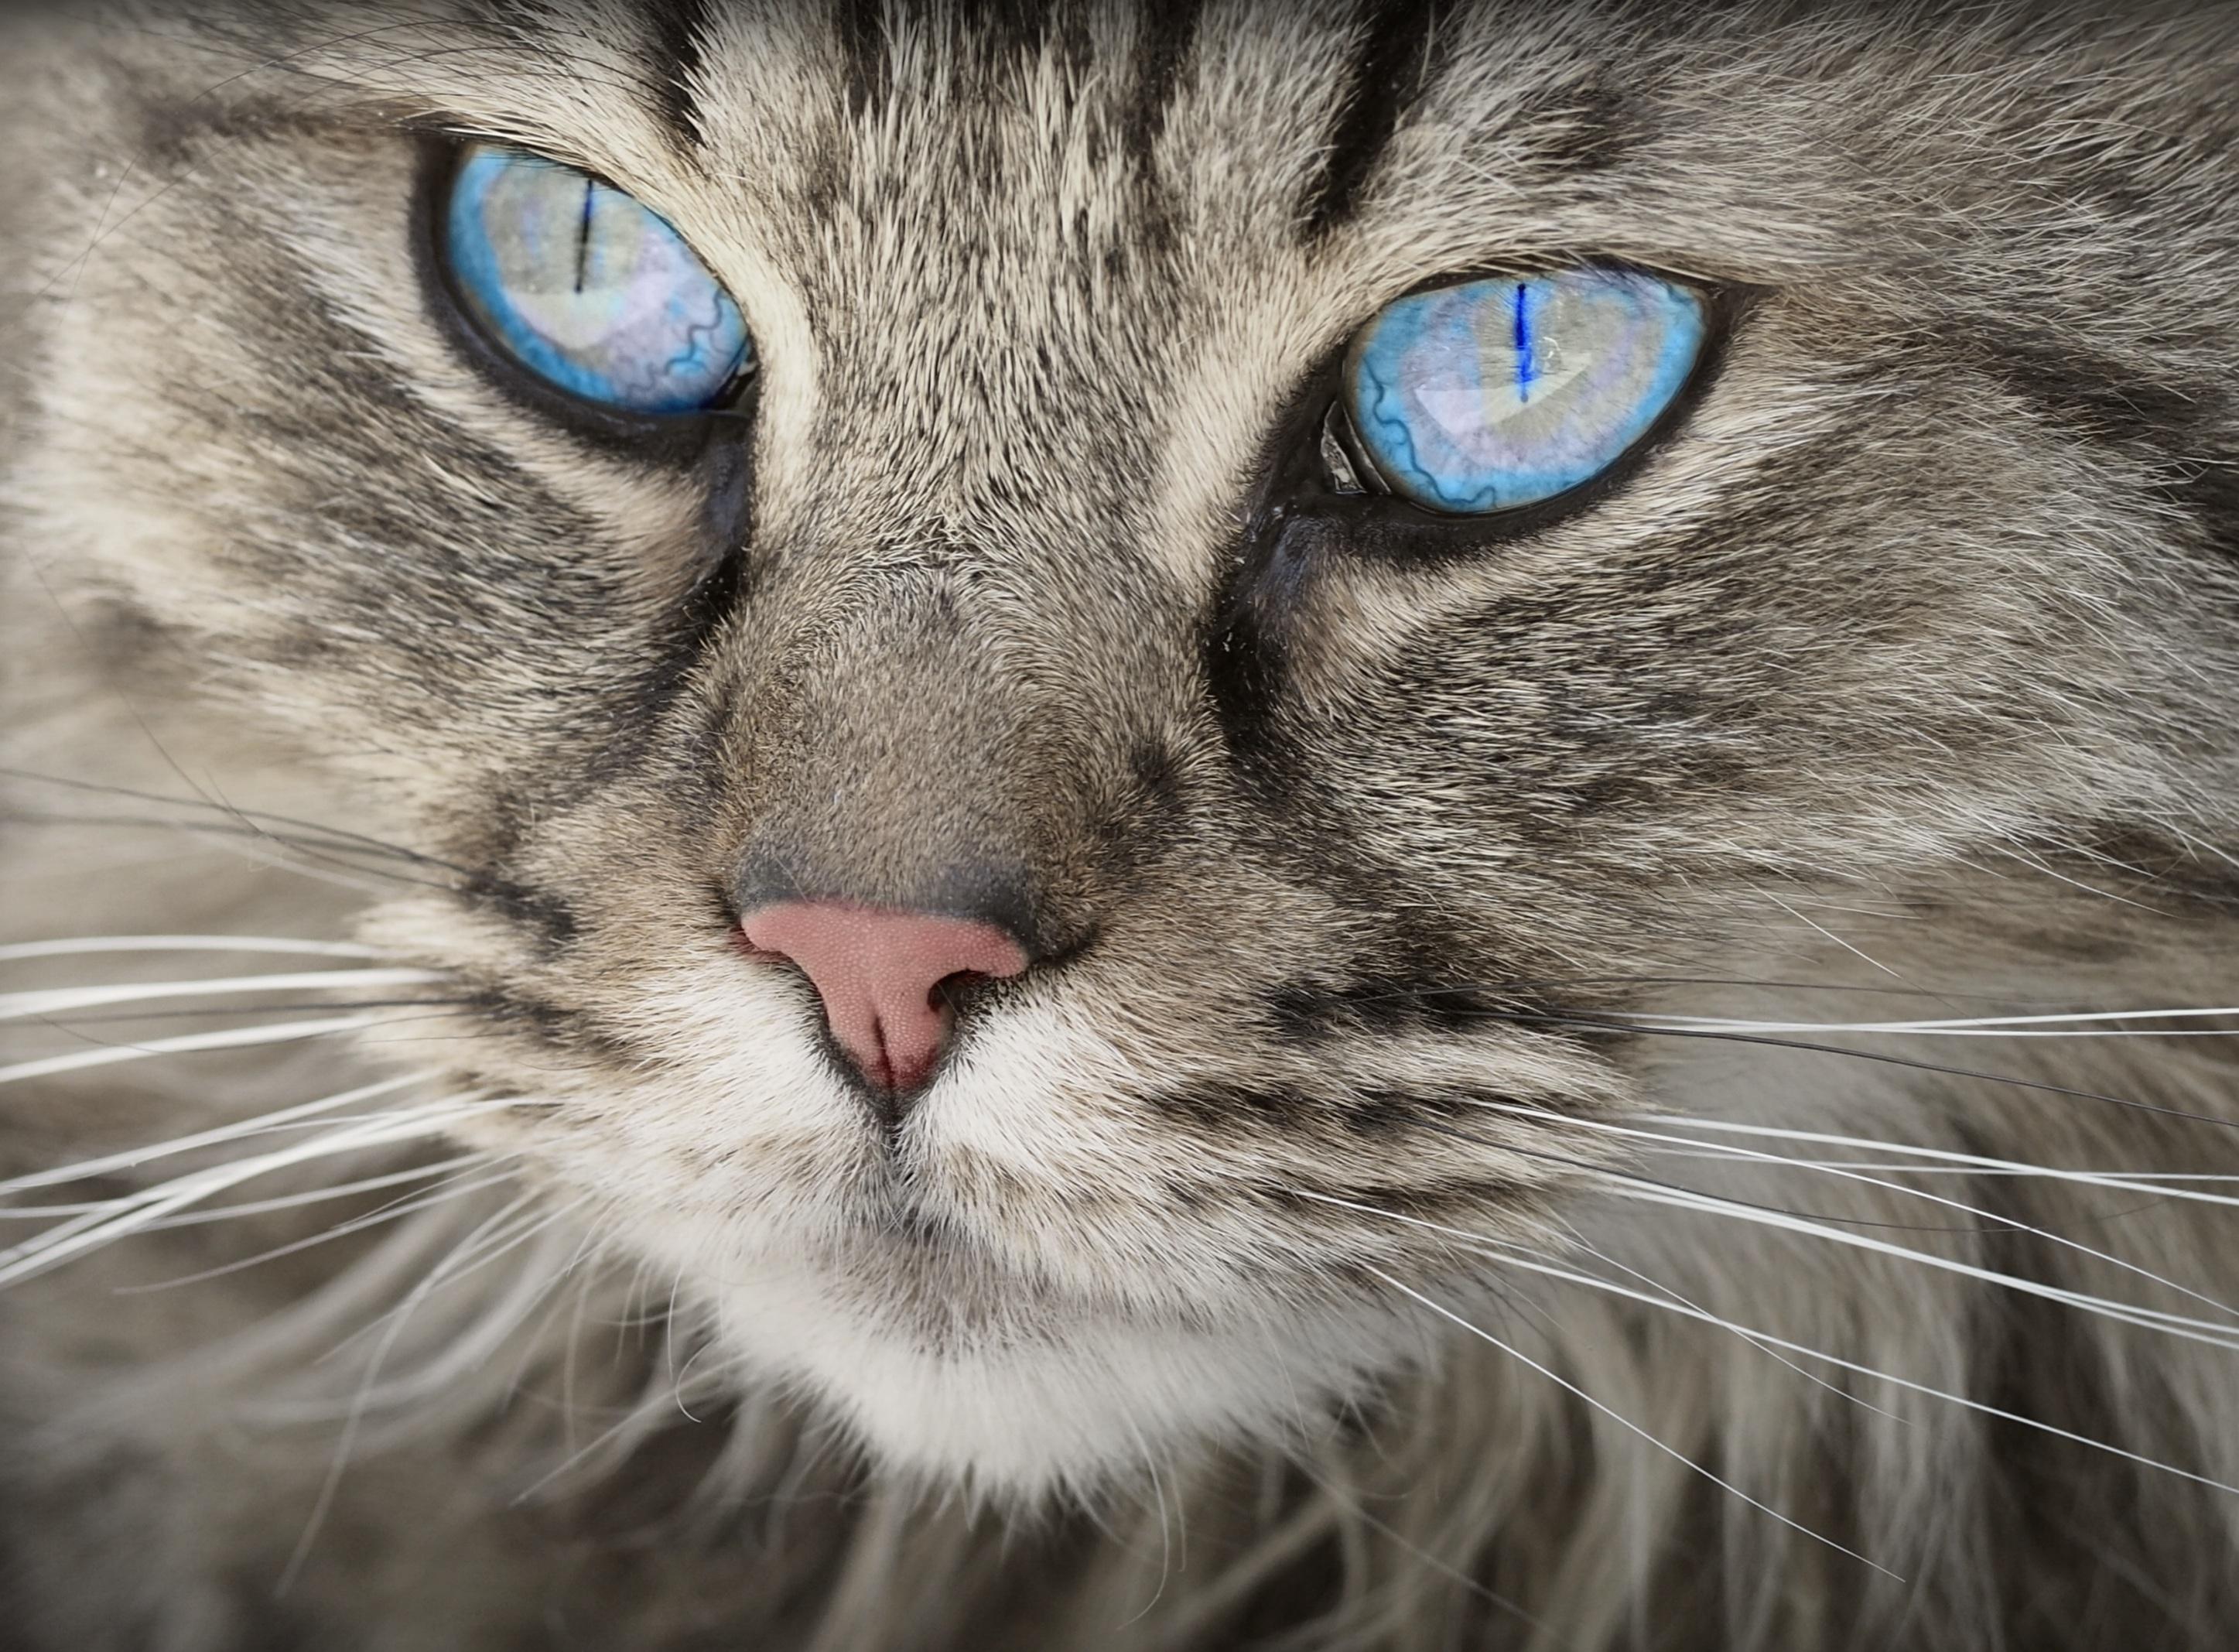 catlike eyes, eyes, animals, cat, blue eyes, eye, look